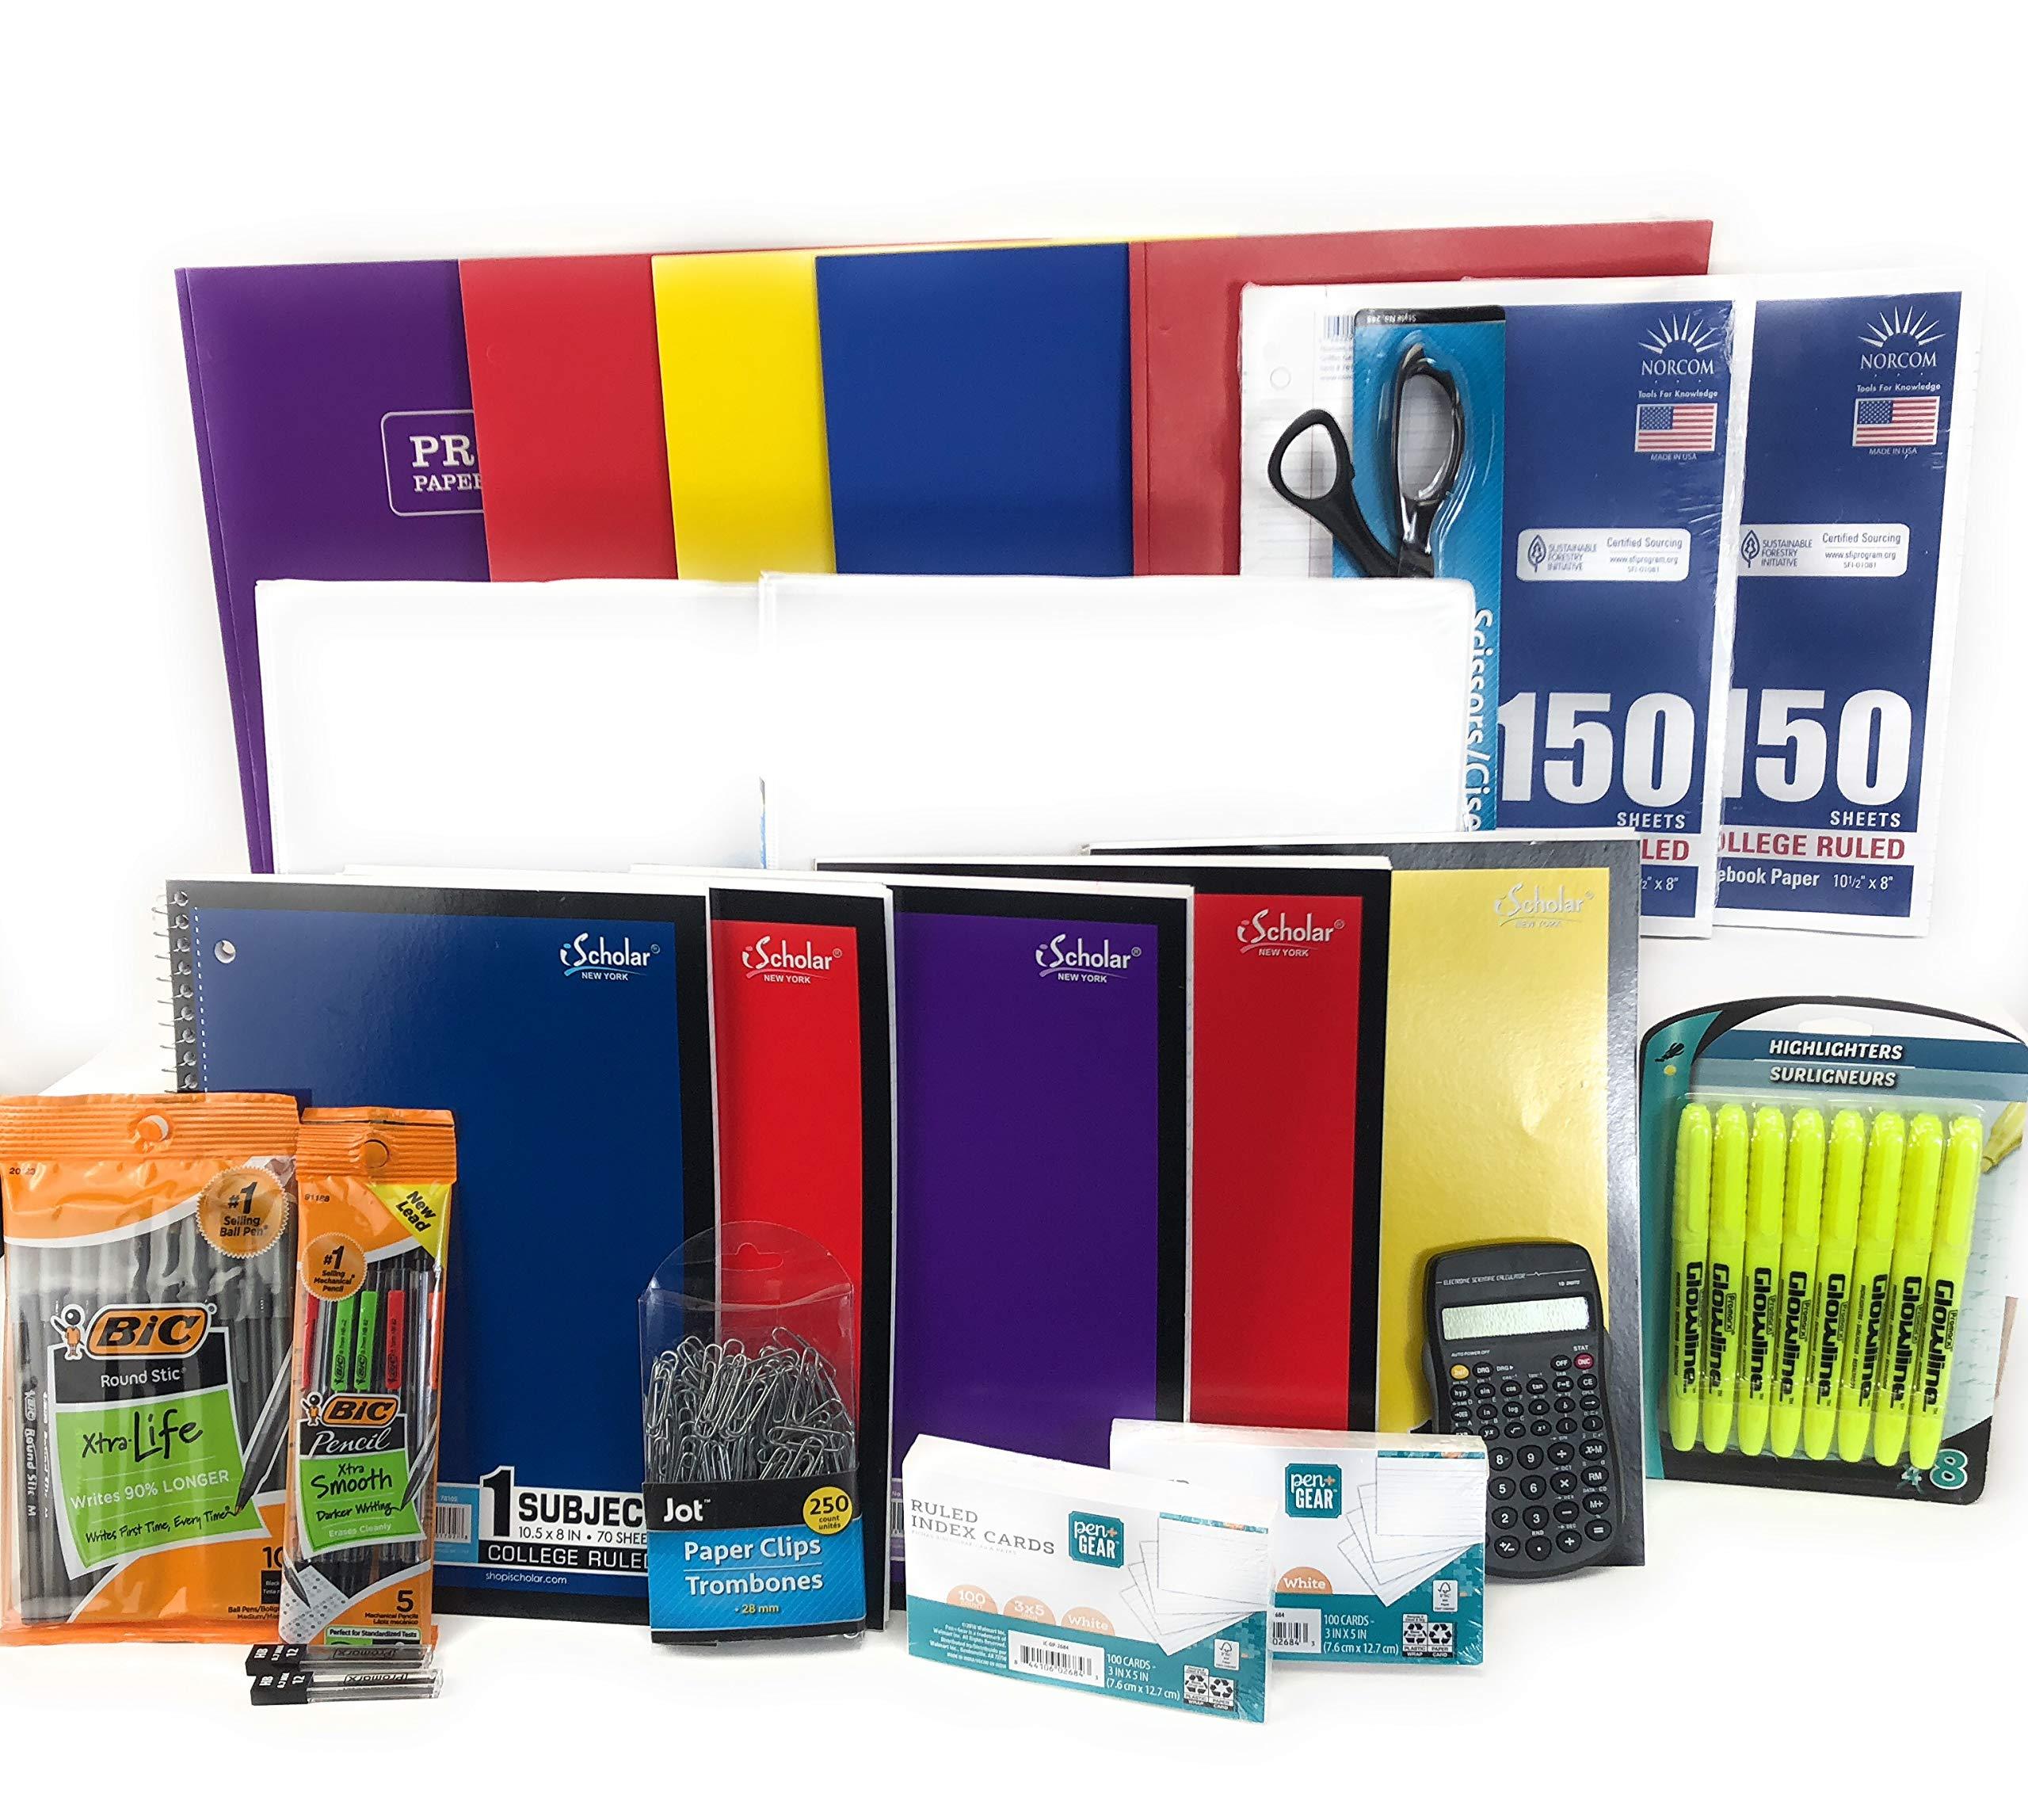 Notebook, Pencils, Pens, Highlighters, Binders, Index Cards, Calculator 44 piece Back to School Bundle